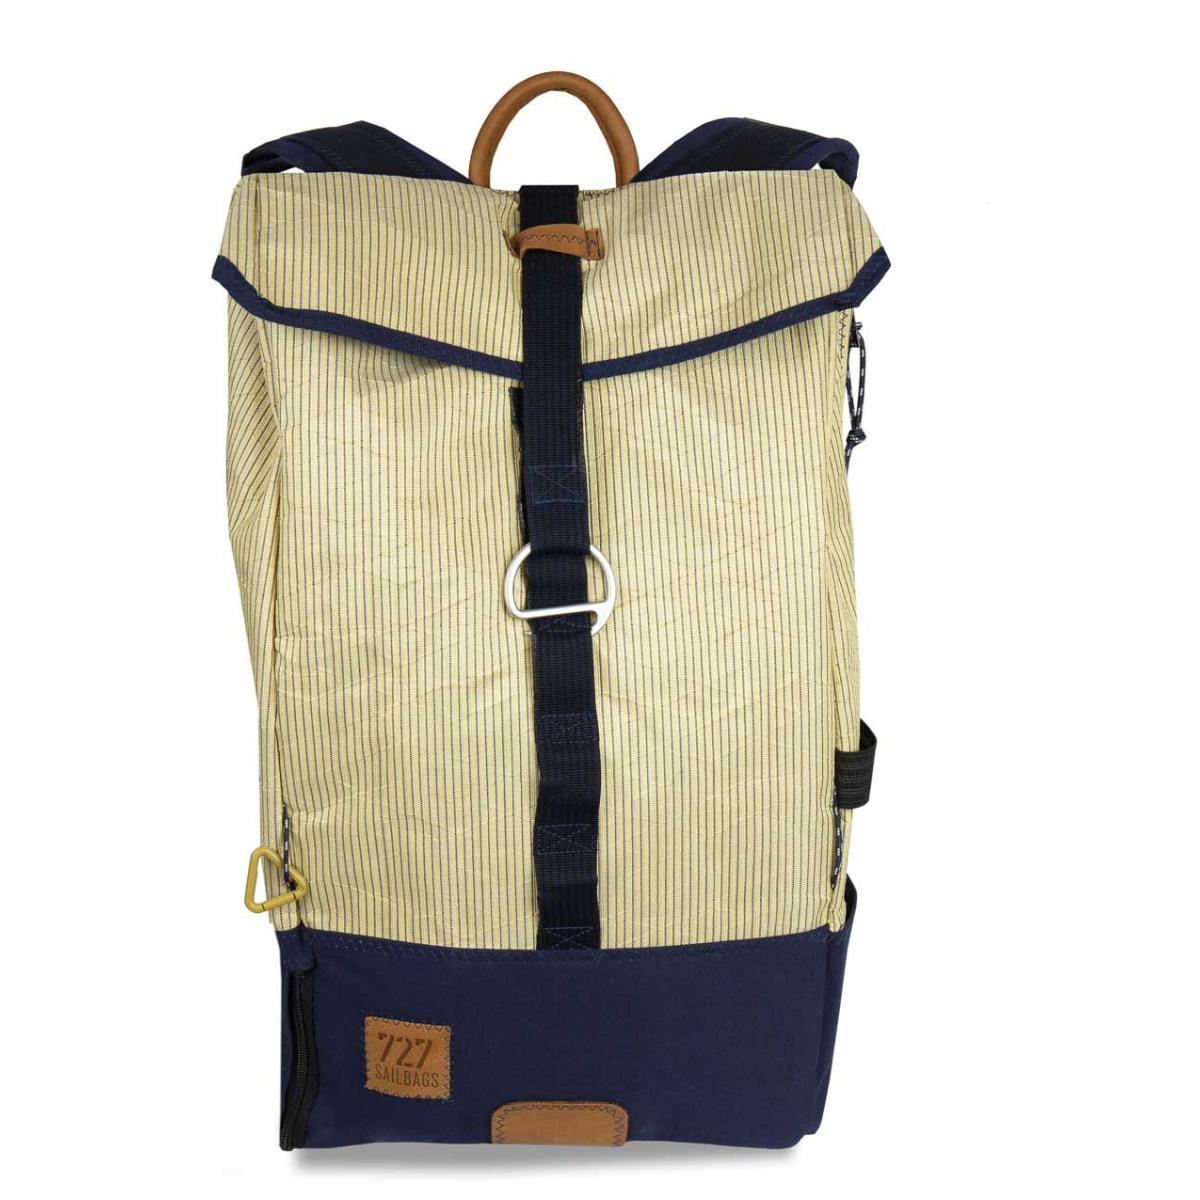 727Sailbags Rücksack Dinghy amber